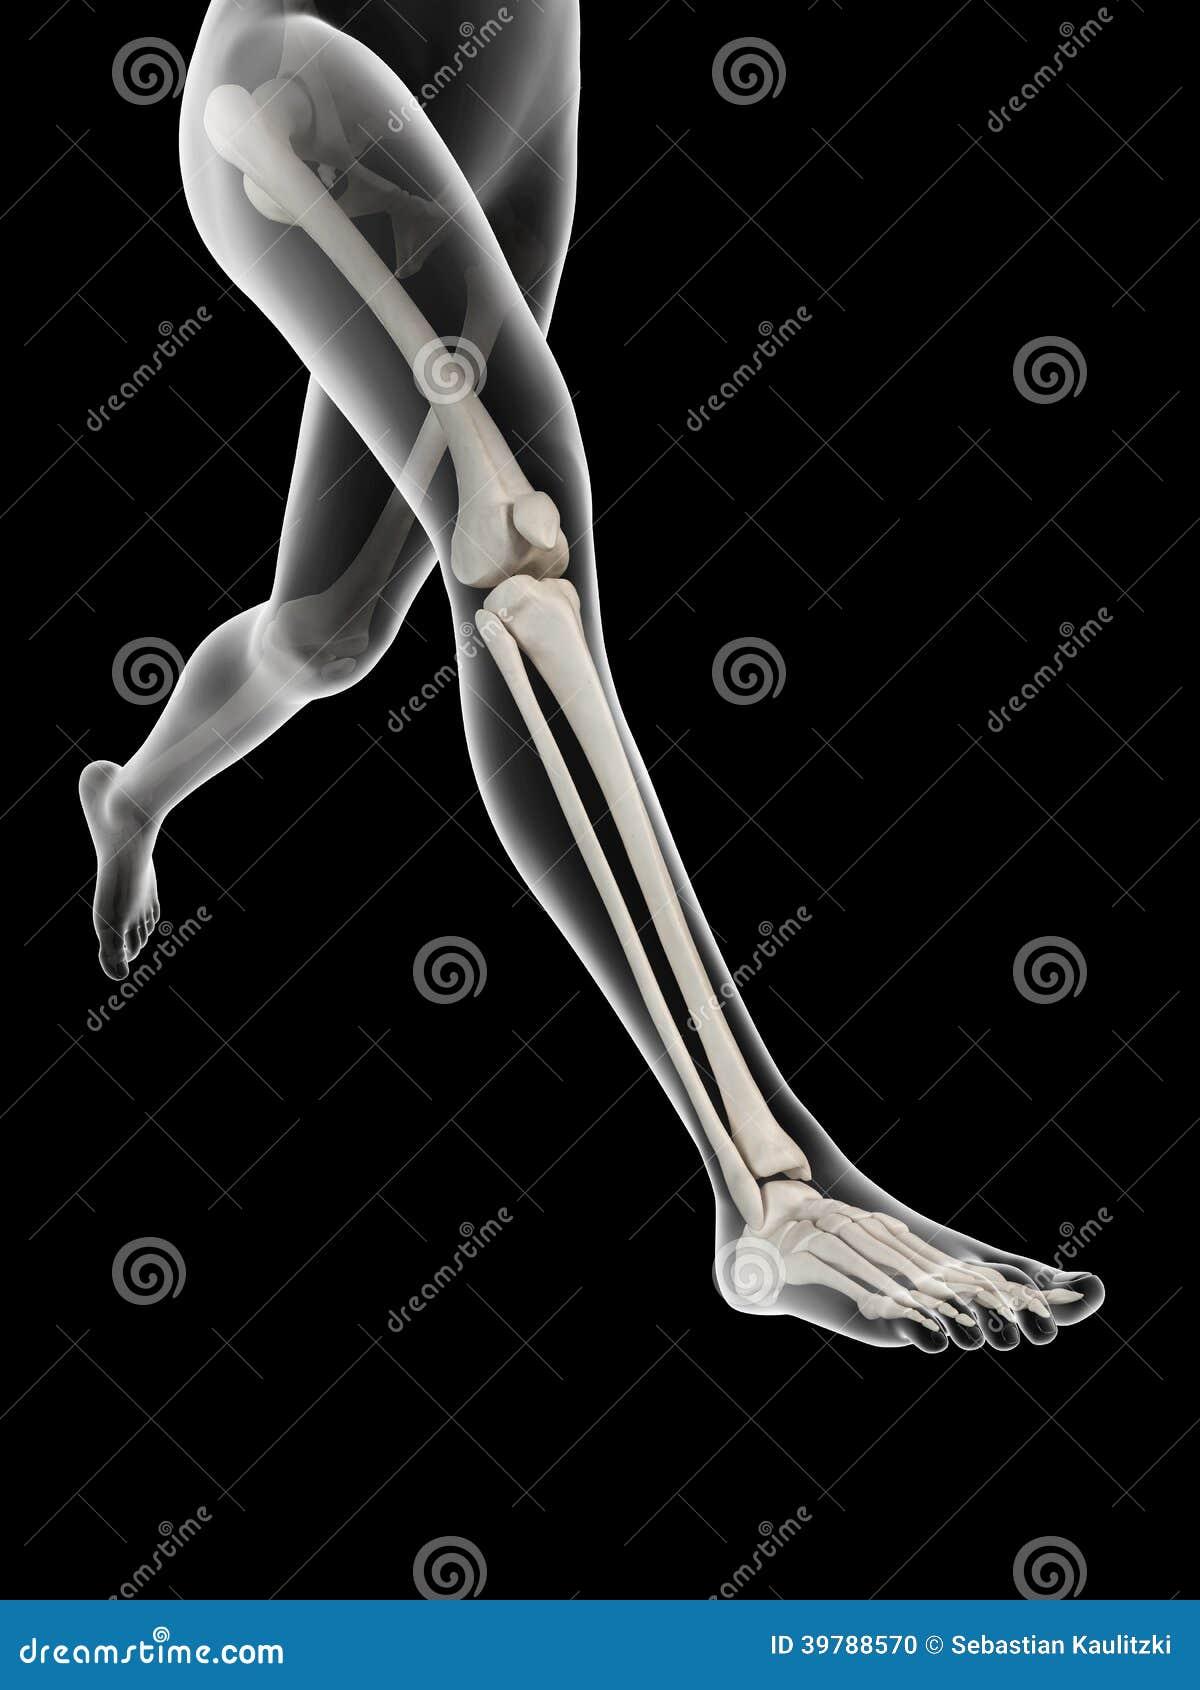 Anatomy Of The Leg Bones Stock Illustration Illustration Of